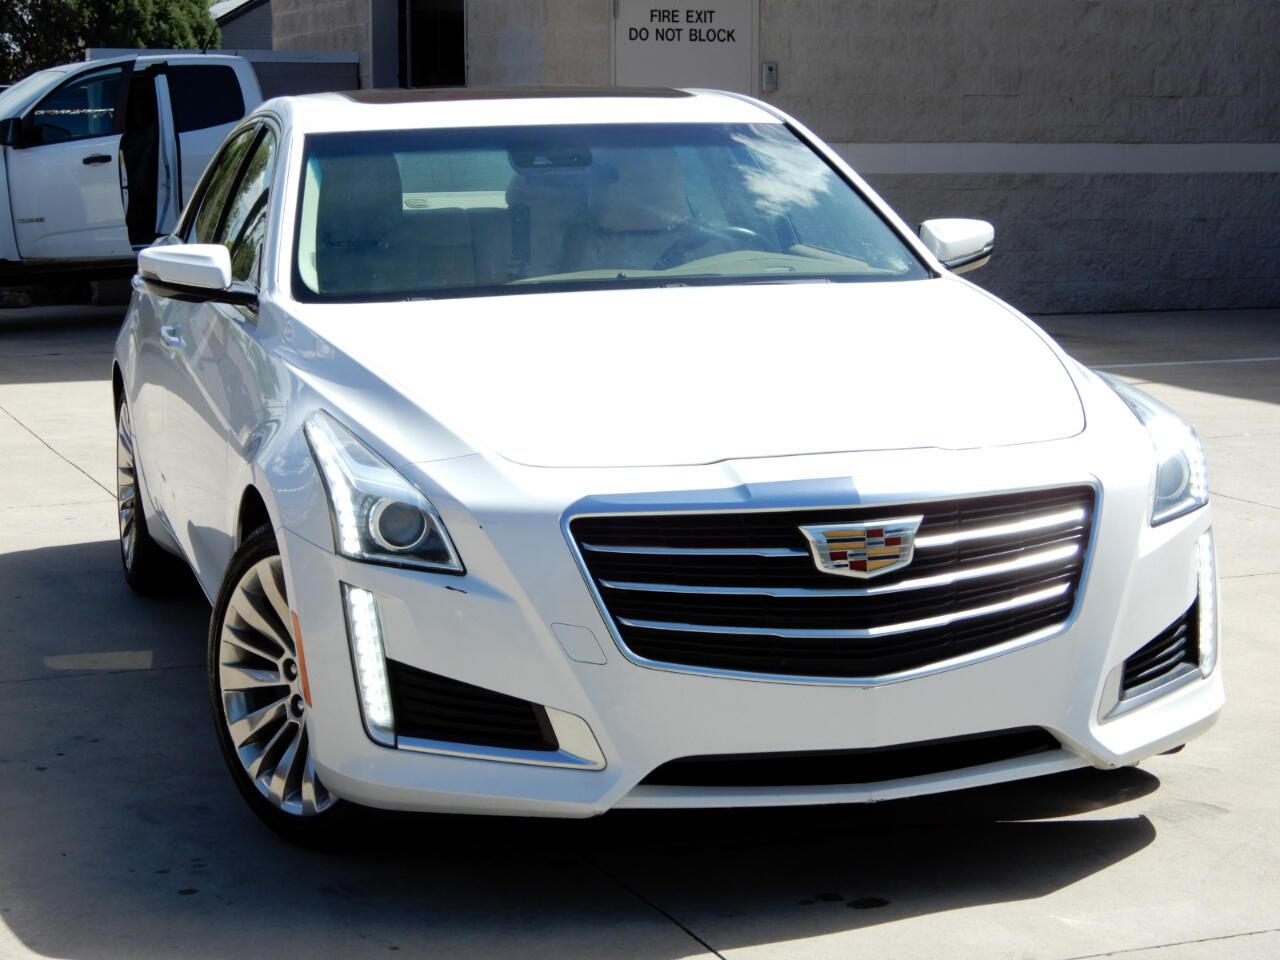 Cadillac CTS Sedan 4dr Sdn 2.0L Turbo Luxury AWD 2015